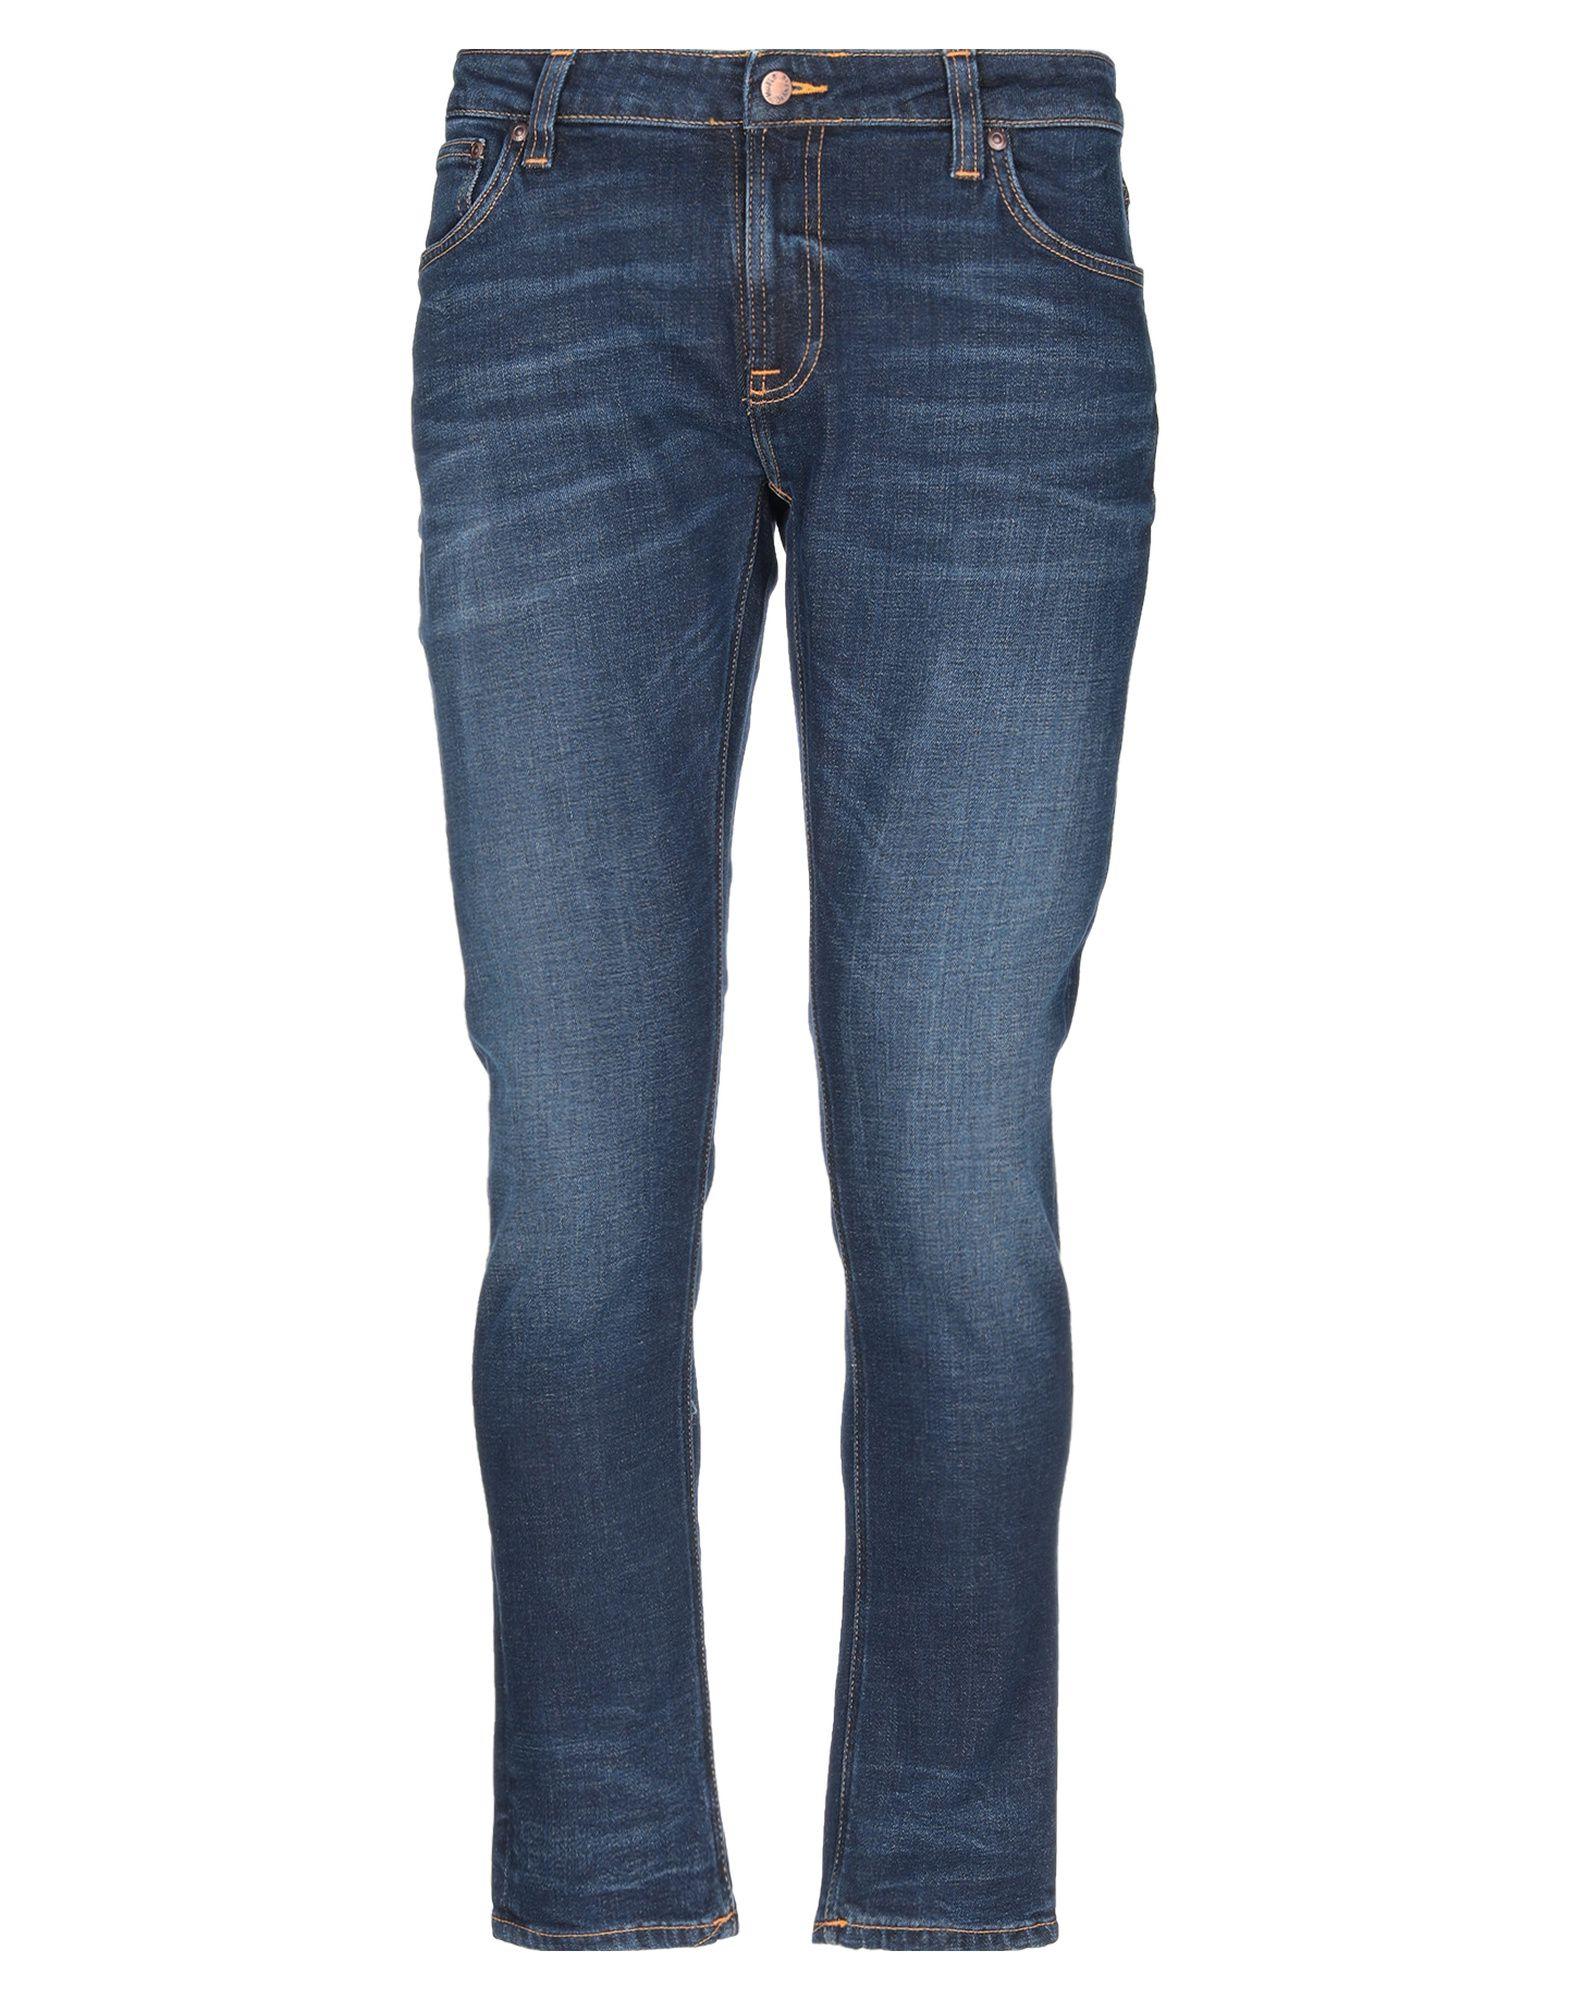 NUDIE JEANS CO Джинсовые брюки цена